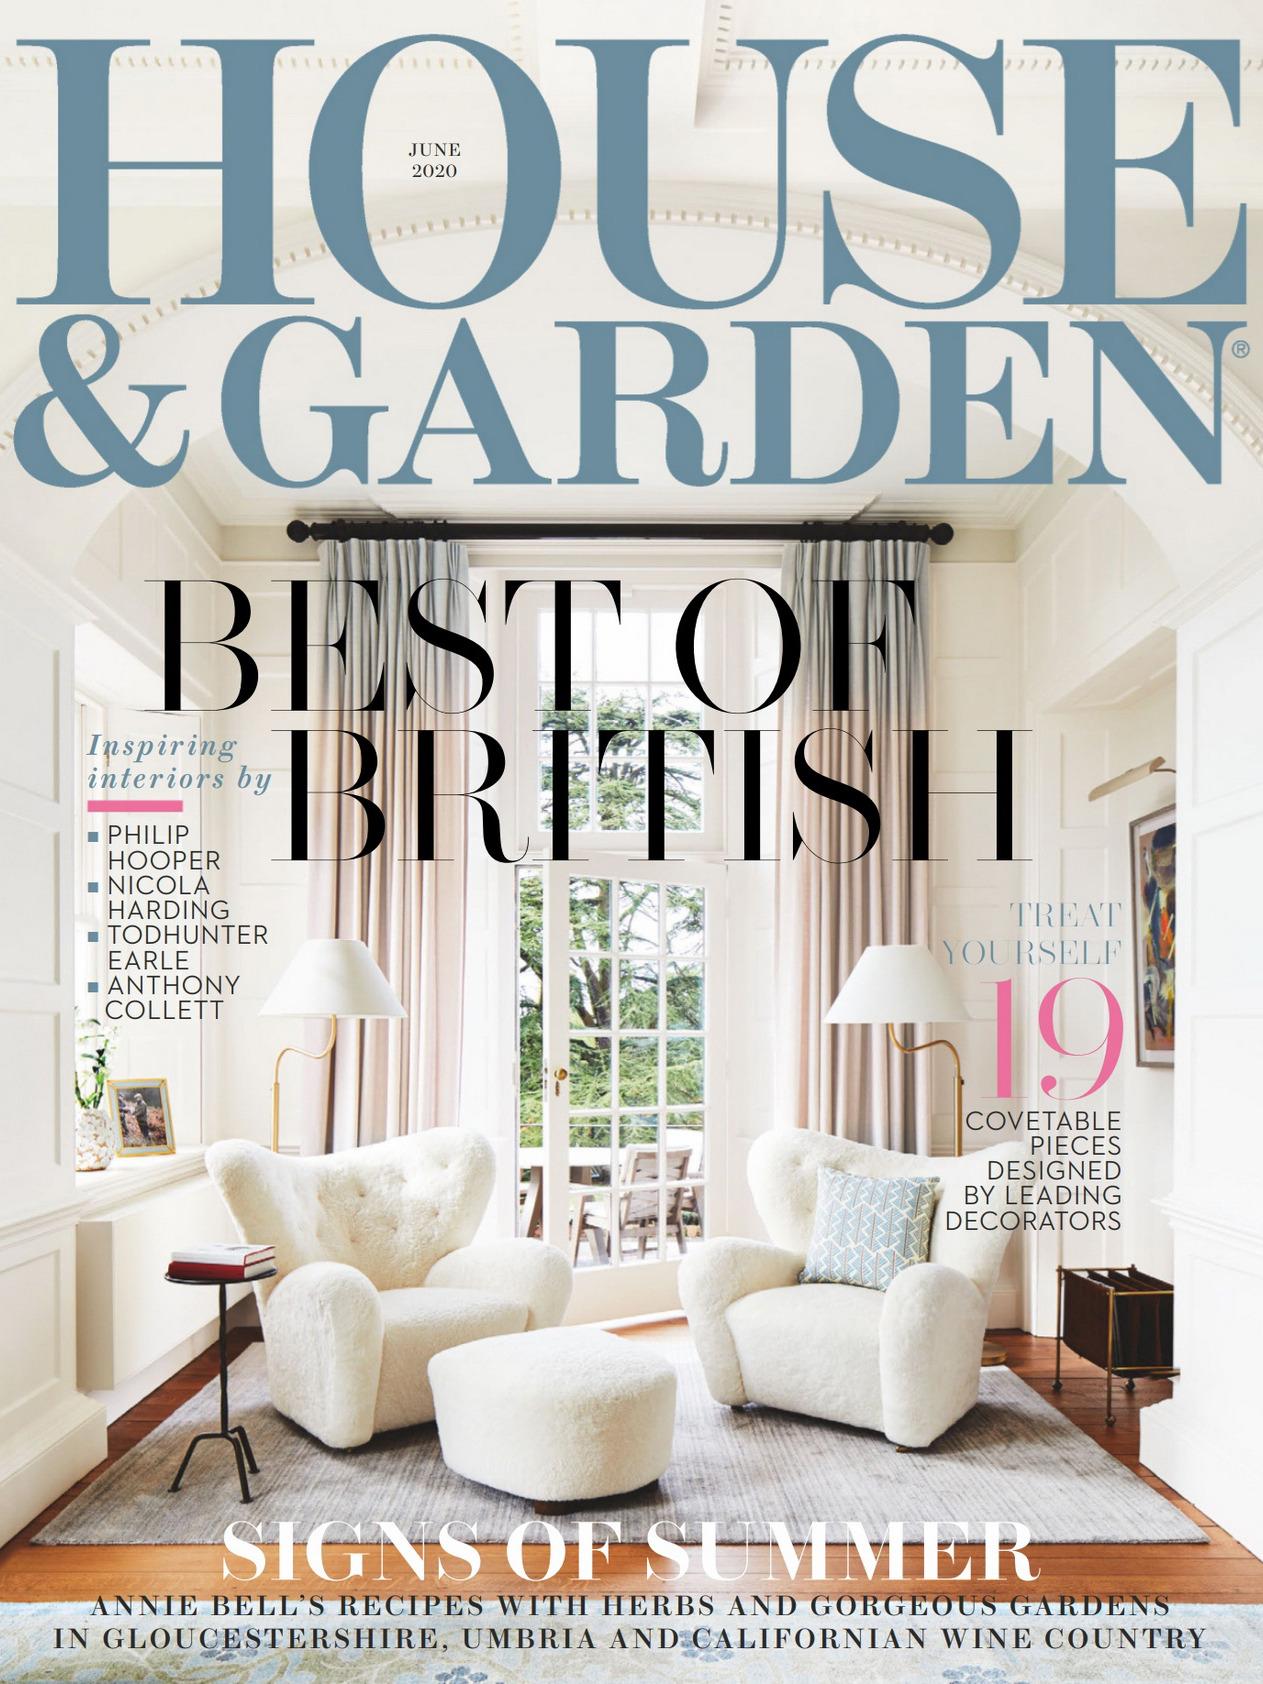 《House & Garden》英国版时尚家居杂志2020年06月号